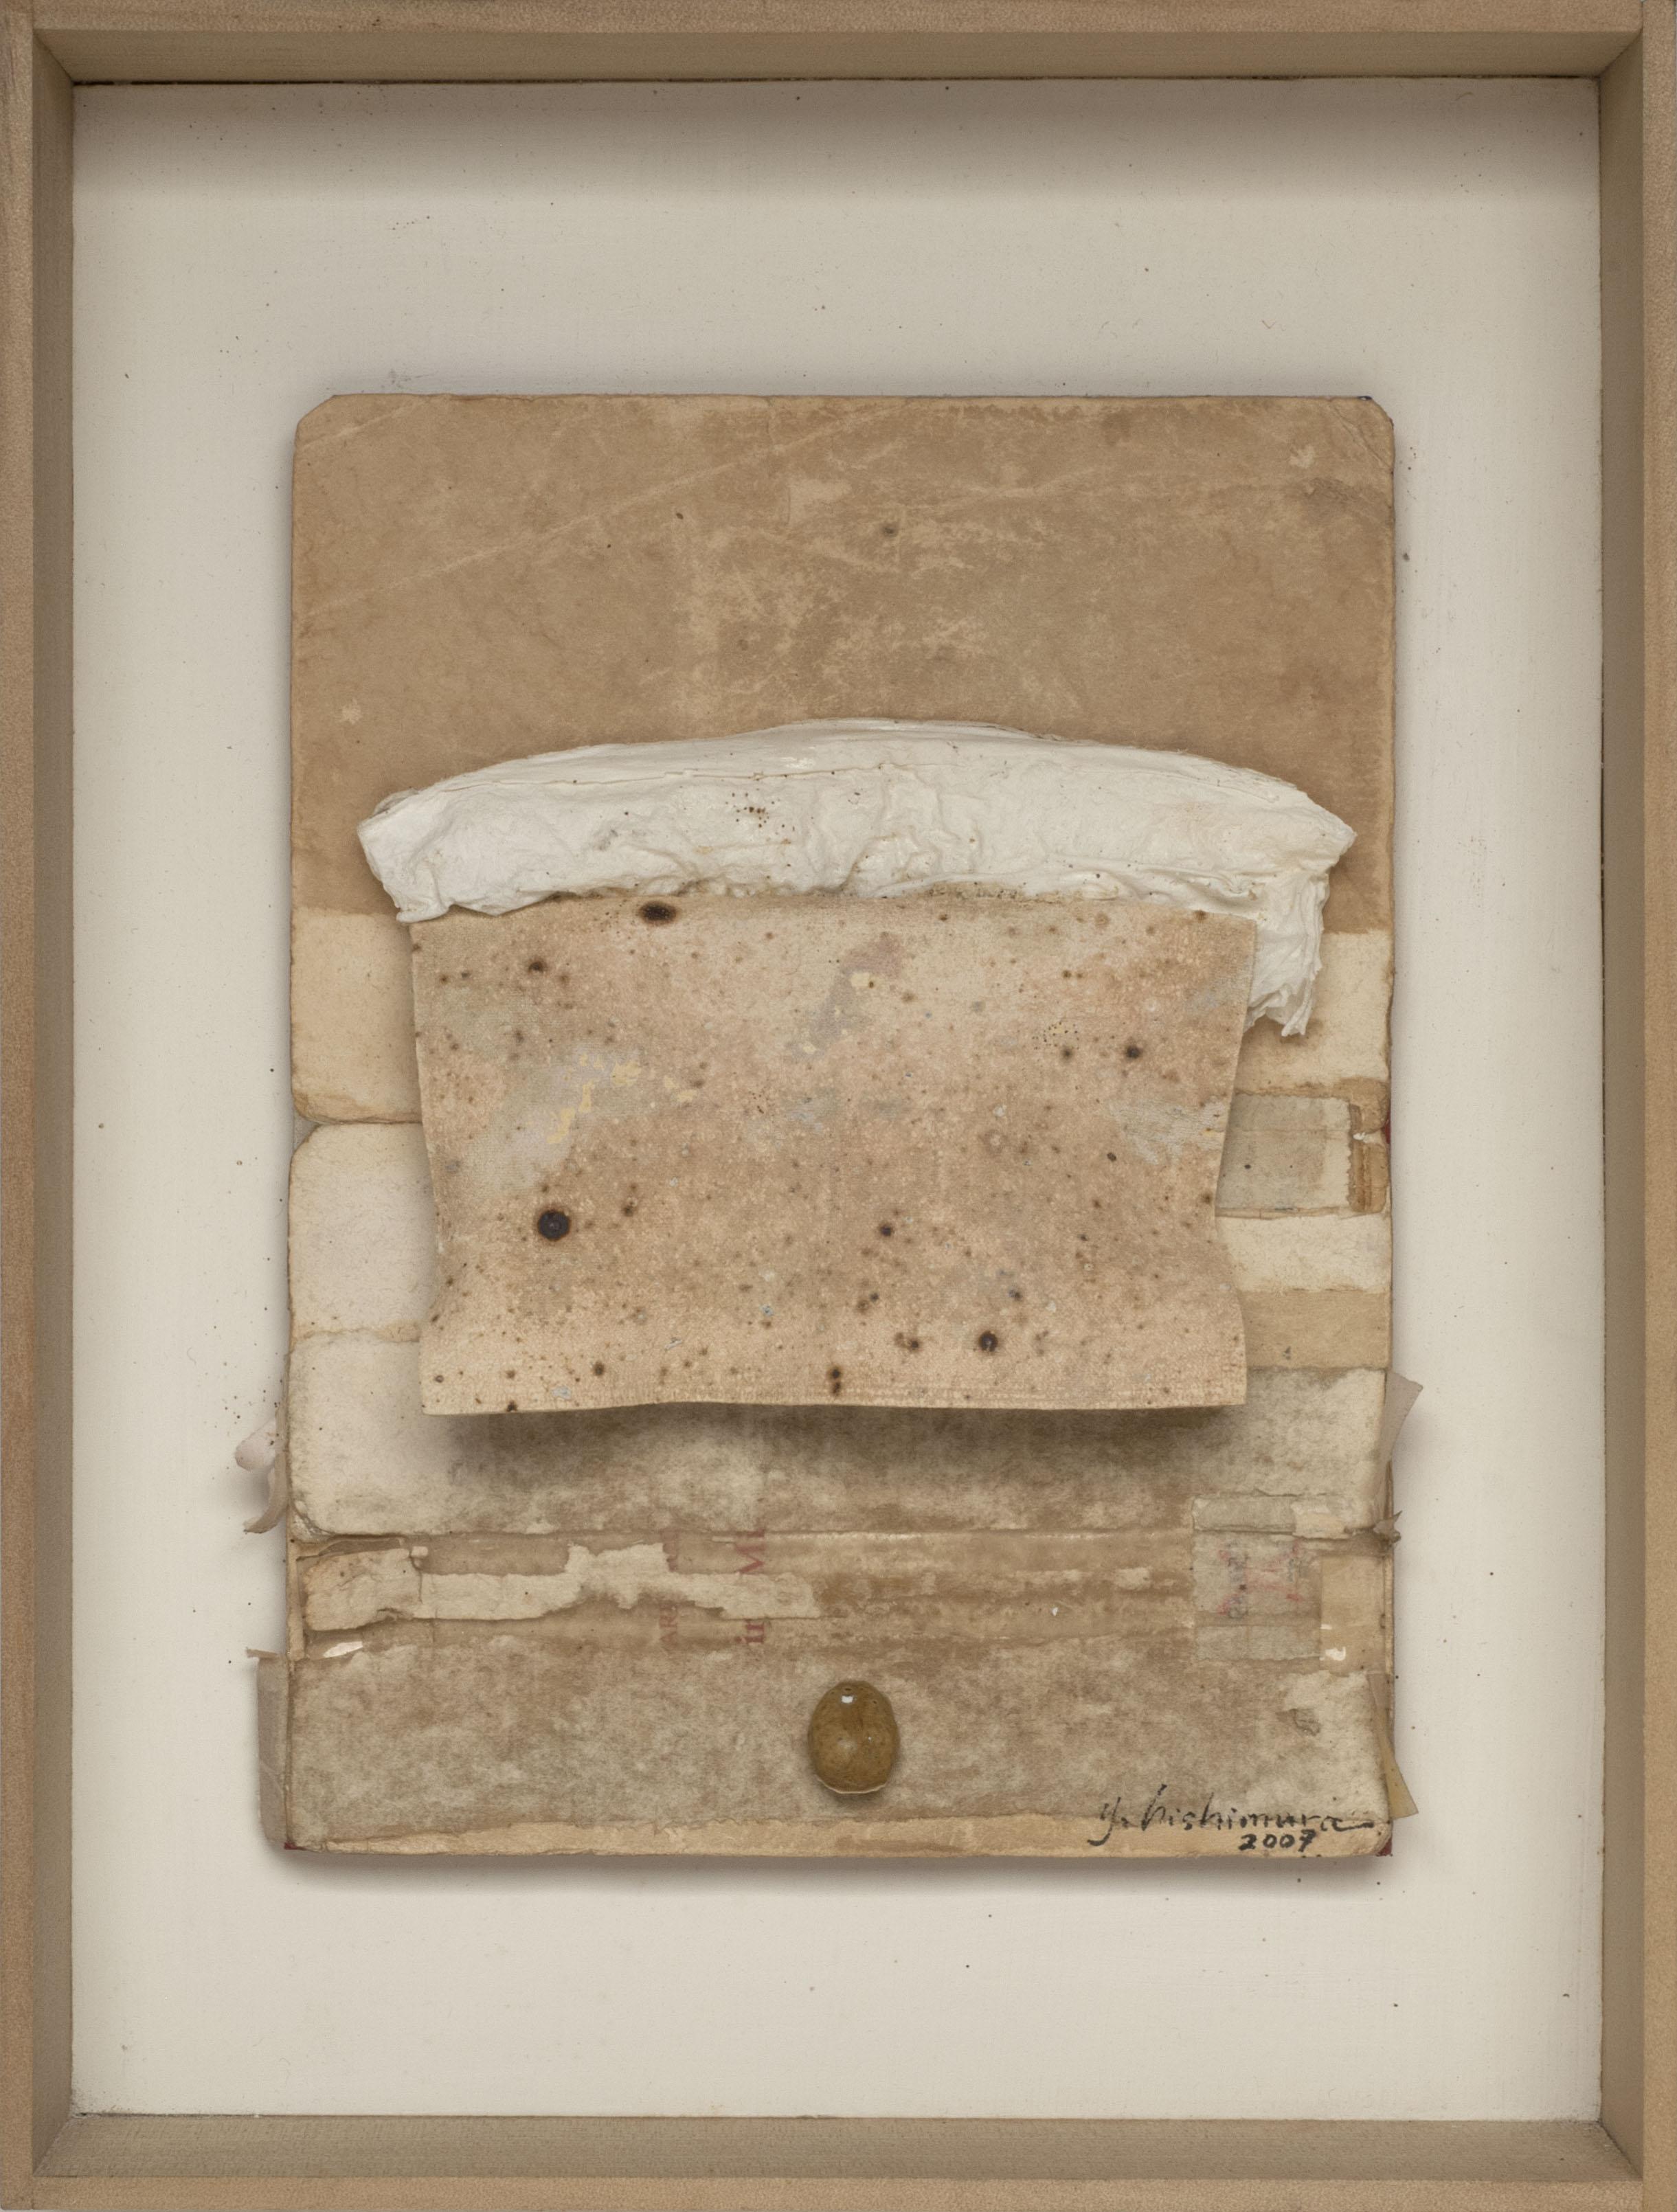 Yohei Nishimura    Museum Catalog - Lost and Found  , 2007 Fired books 9 x 6.5 x 1.5 inches / 22.9 x 16.5 x 3.8 cm / YN 142